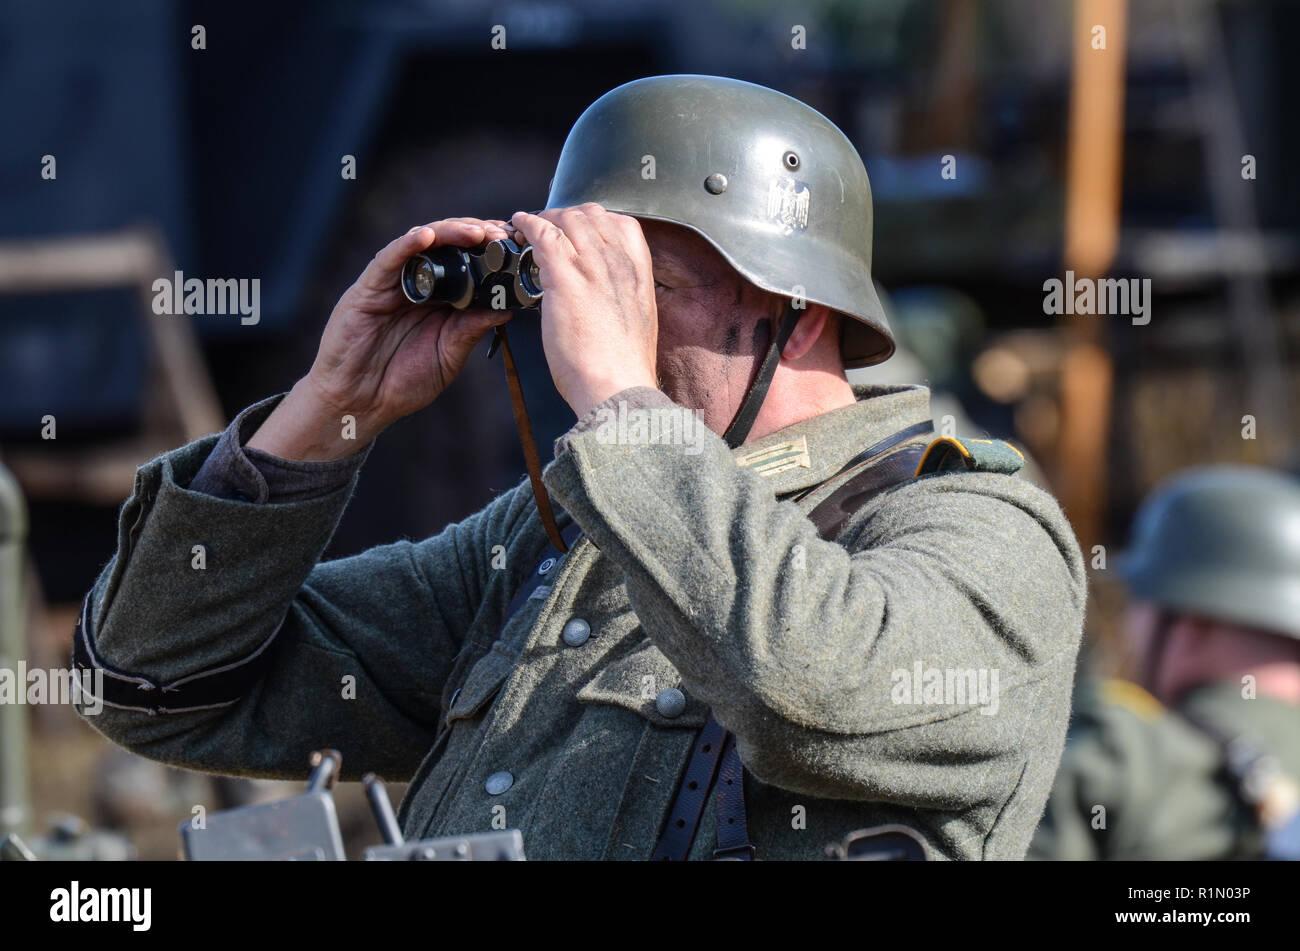 Re enactor re enactment eines zweiten weltkrieg bundeswehrsoldat